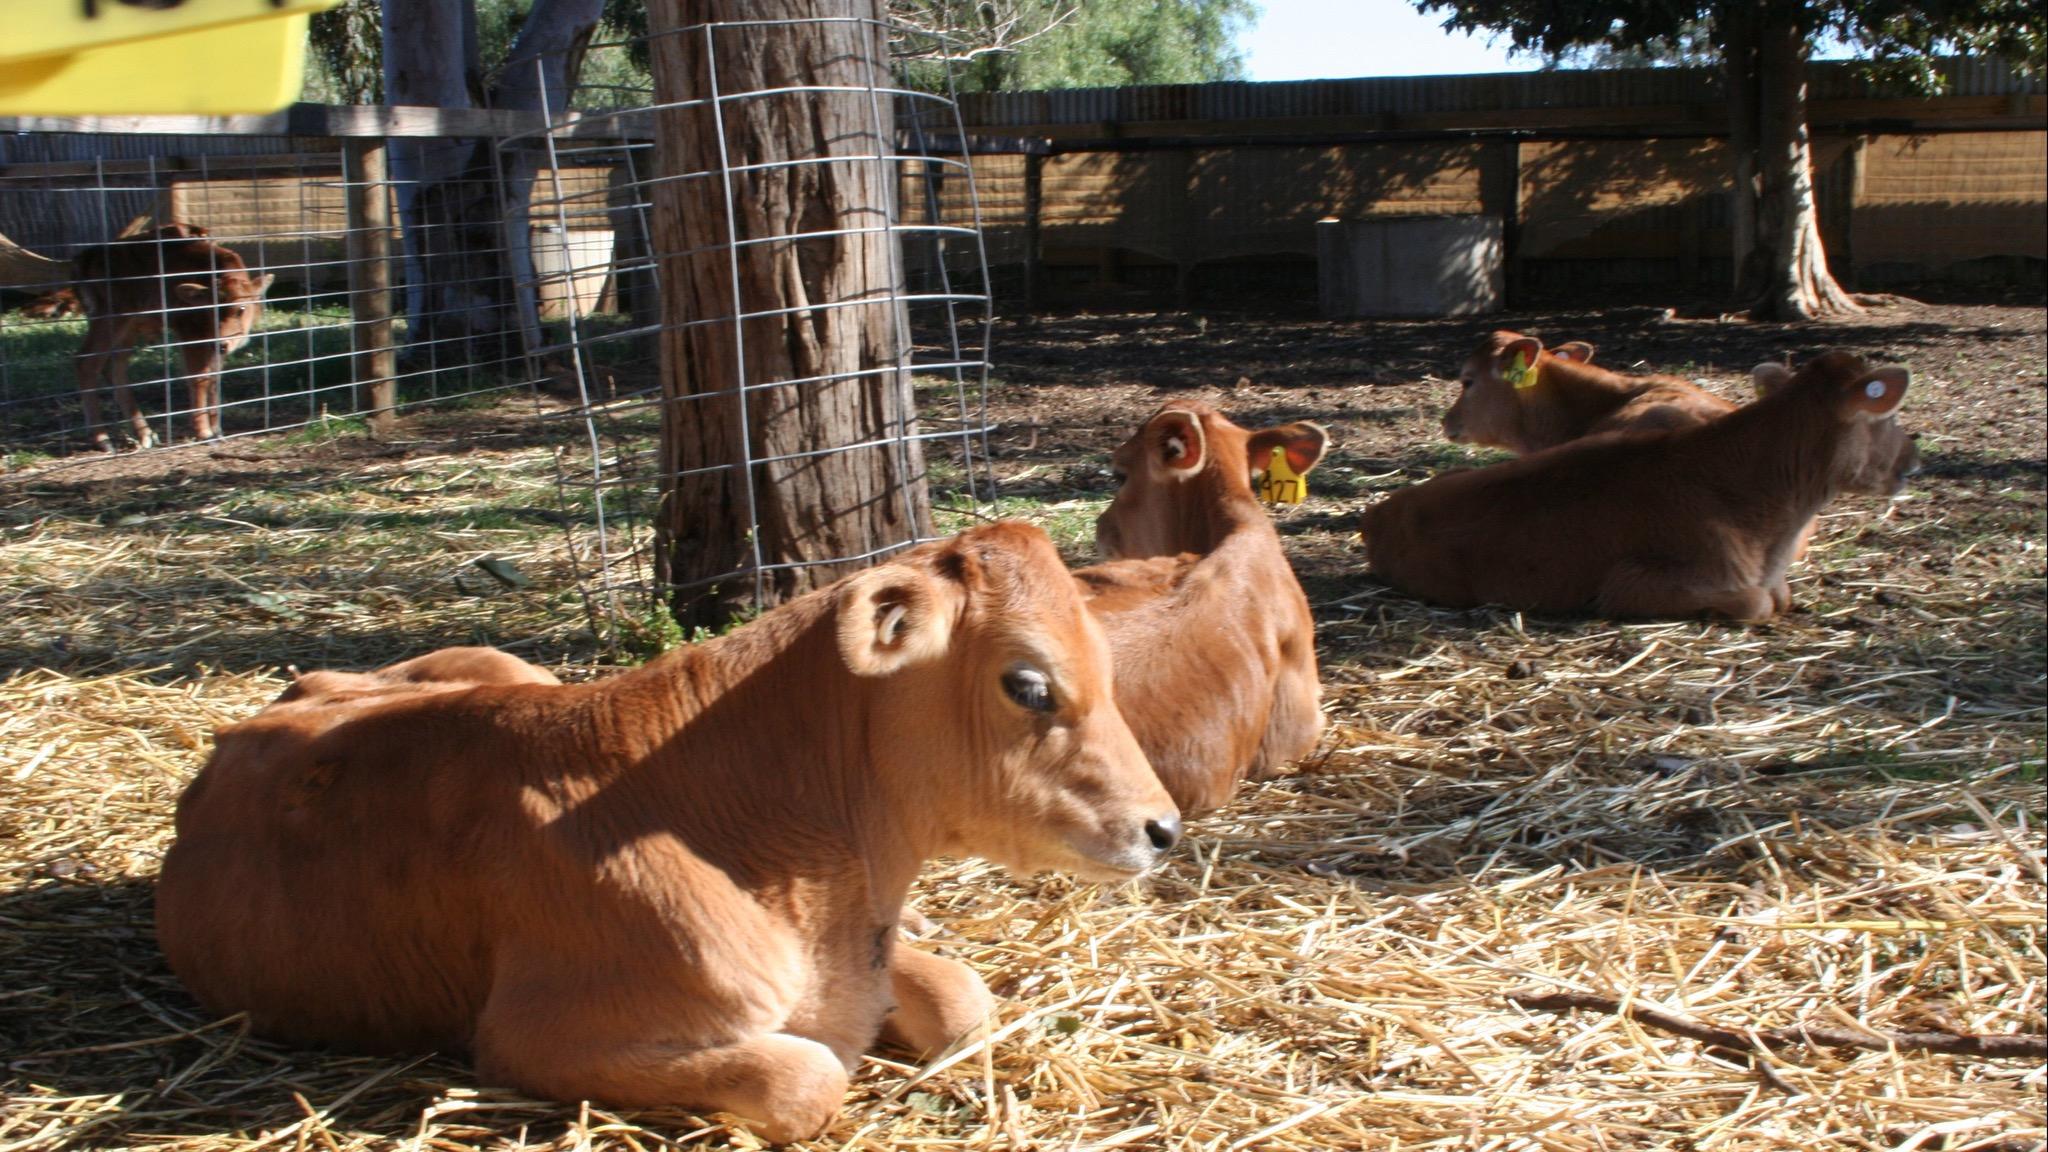 Baby calves enjoying the sunshine